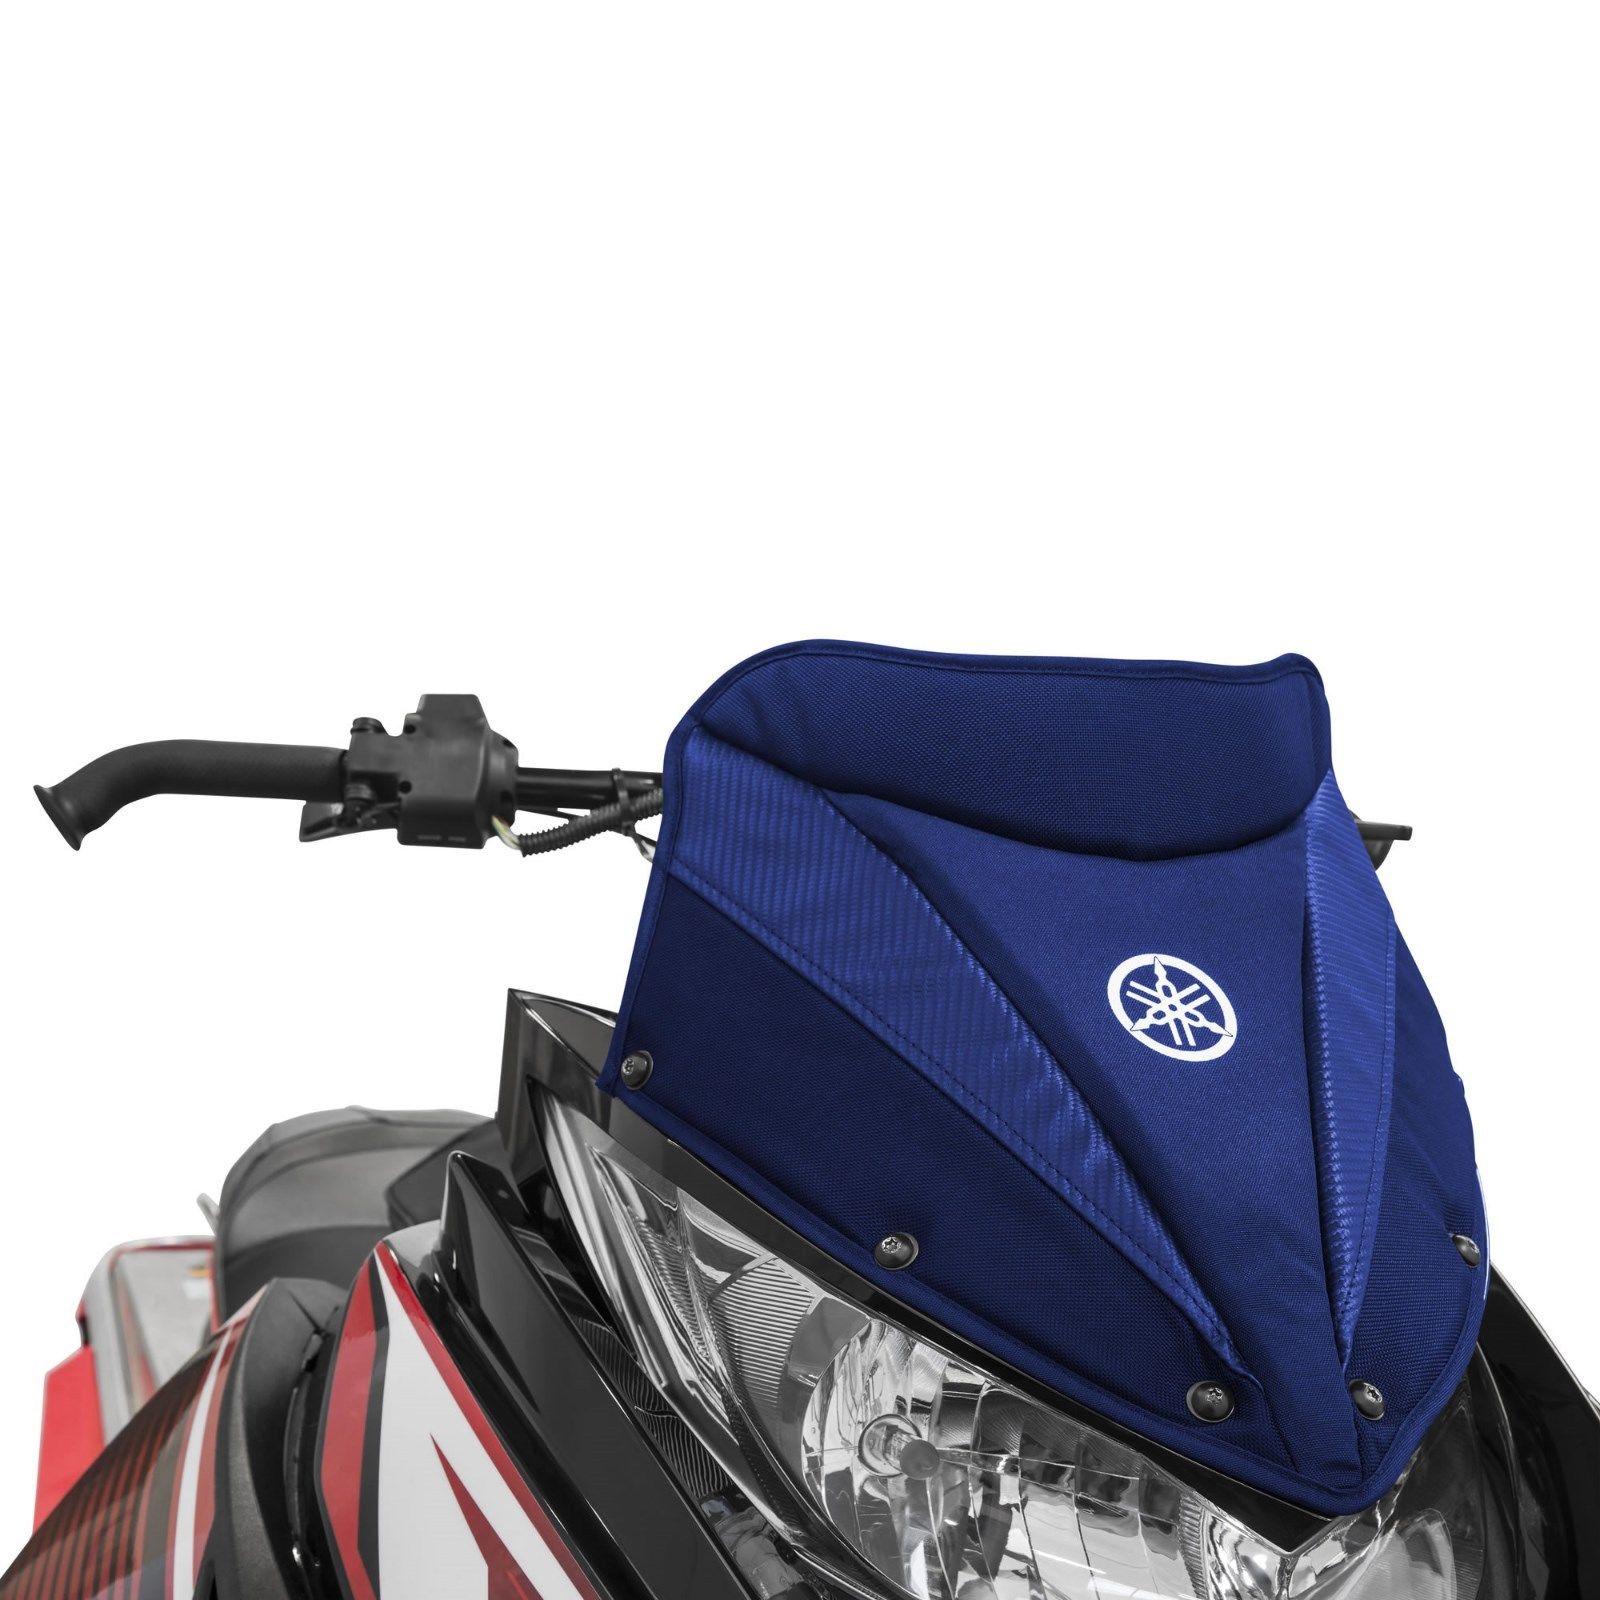 Yamaha sr viper flexible windshield blue 2015 sma 8kg96 00 for Yamaha sx viper windshield